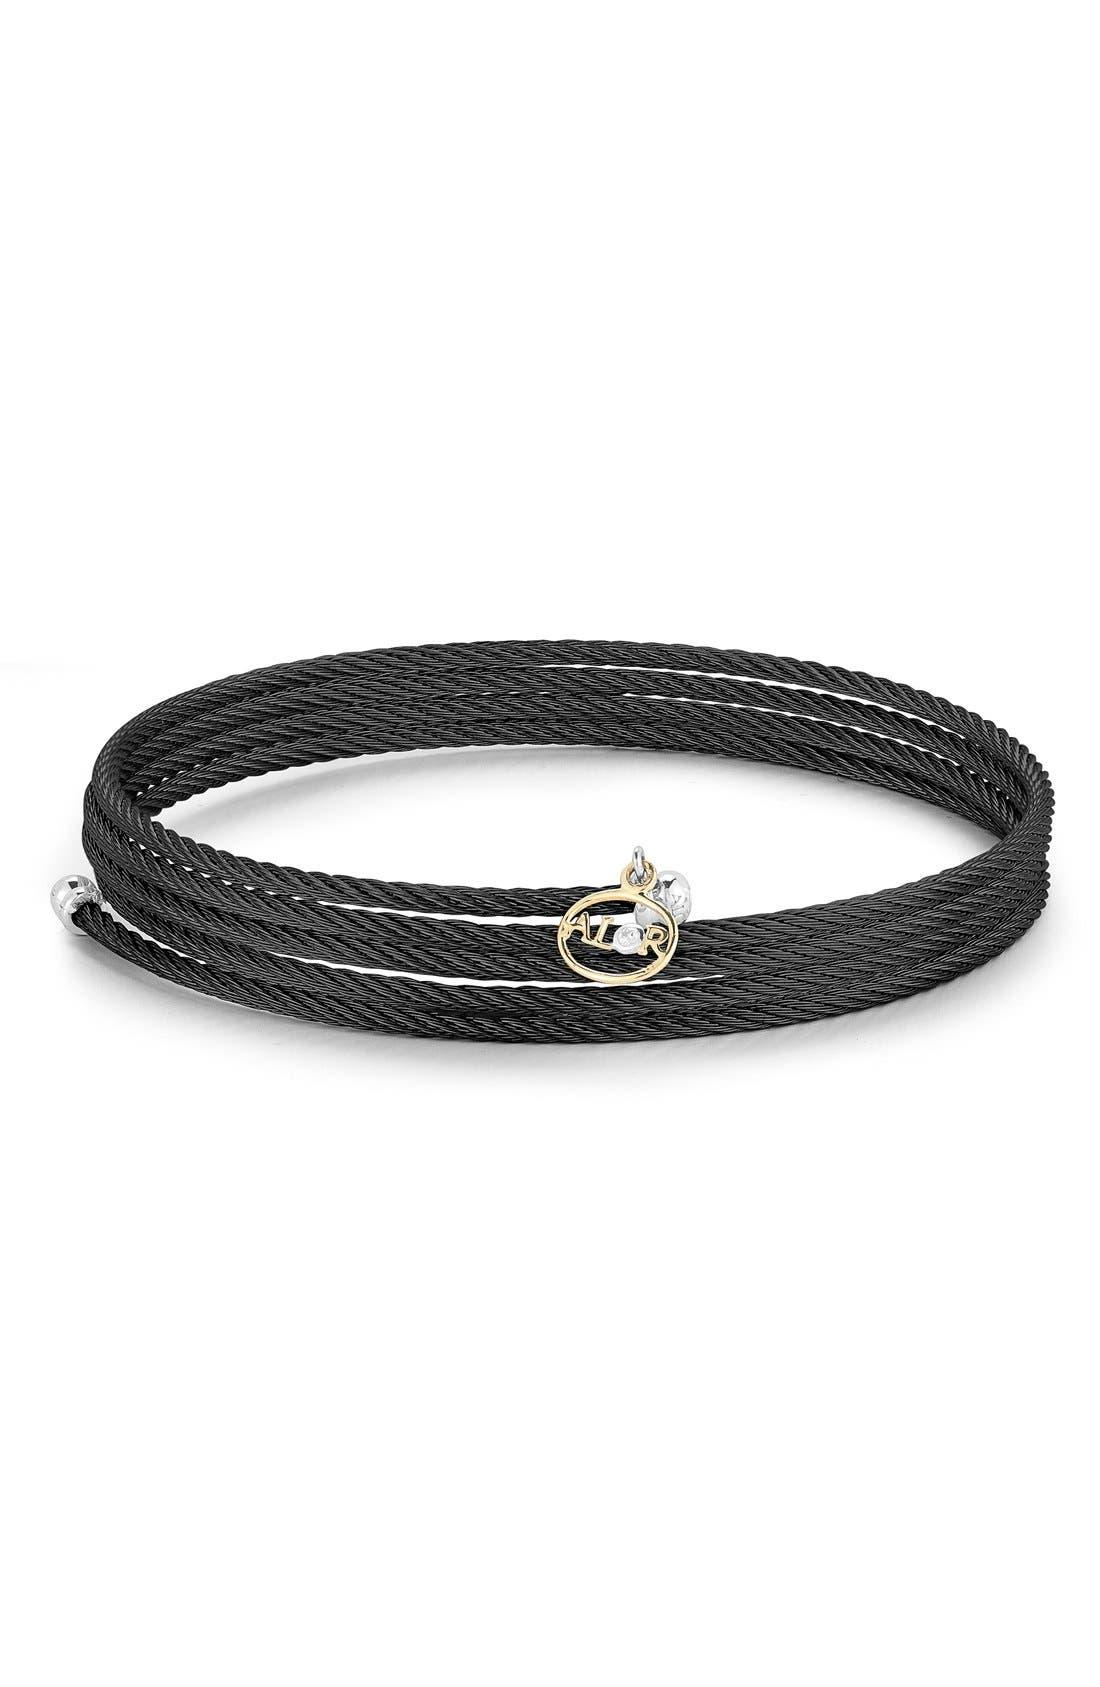 Alternate Image 1 Selected - ALOR® Coil Bracelet